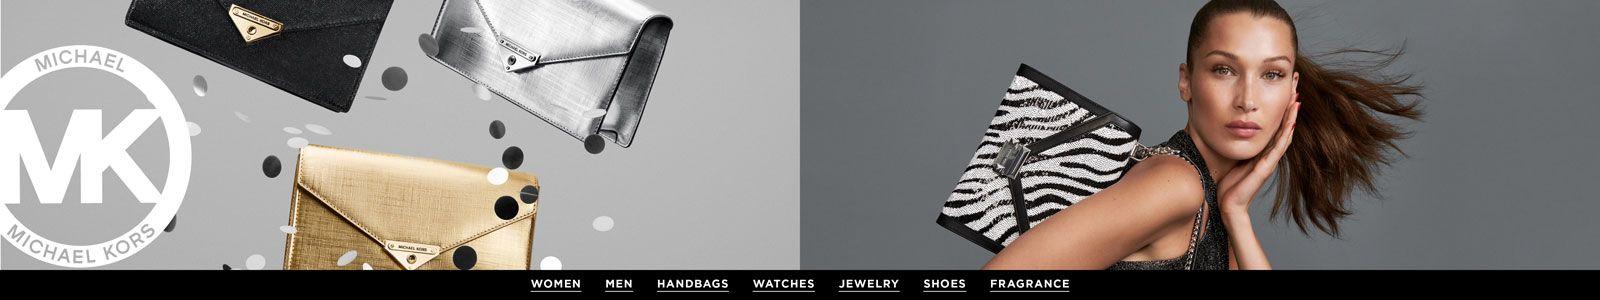 Michael Kors, Women, Mens, Handbags, Watches, Jewelry Shoes, Fragrance